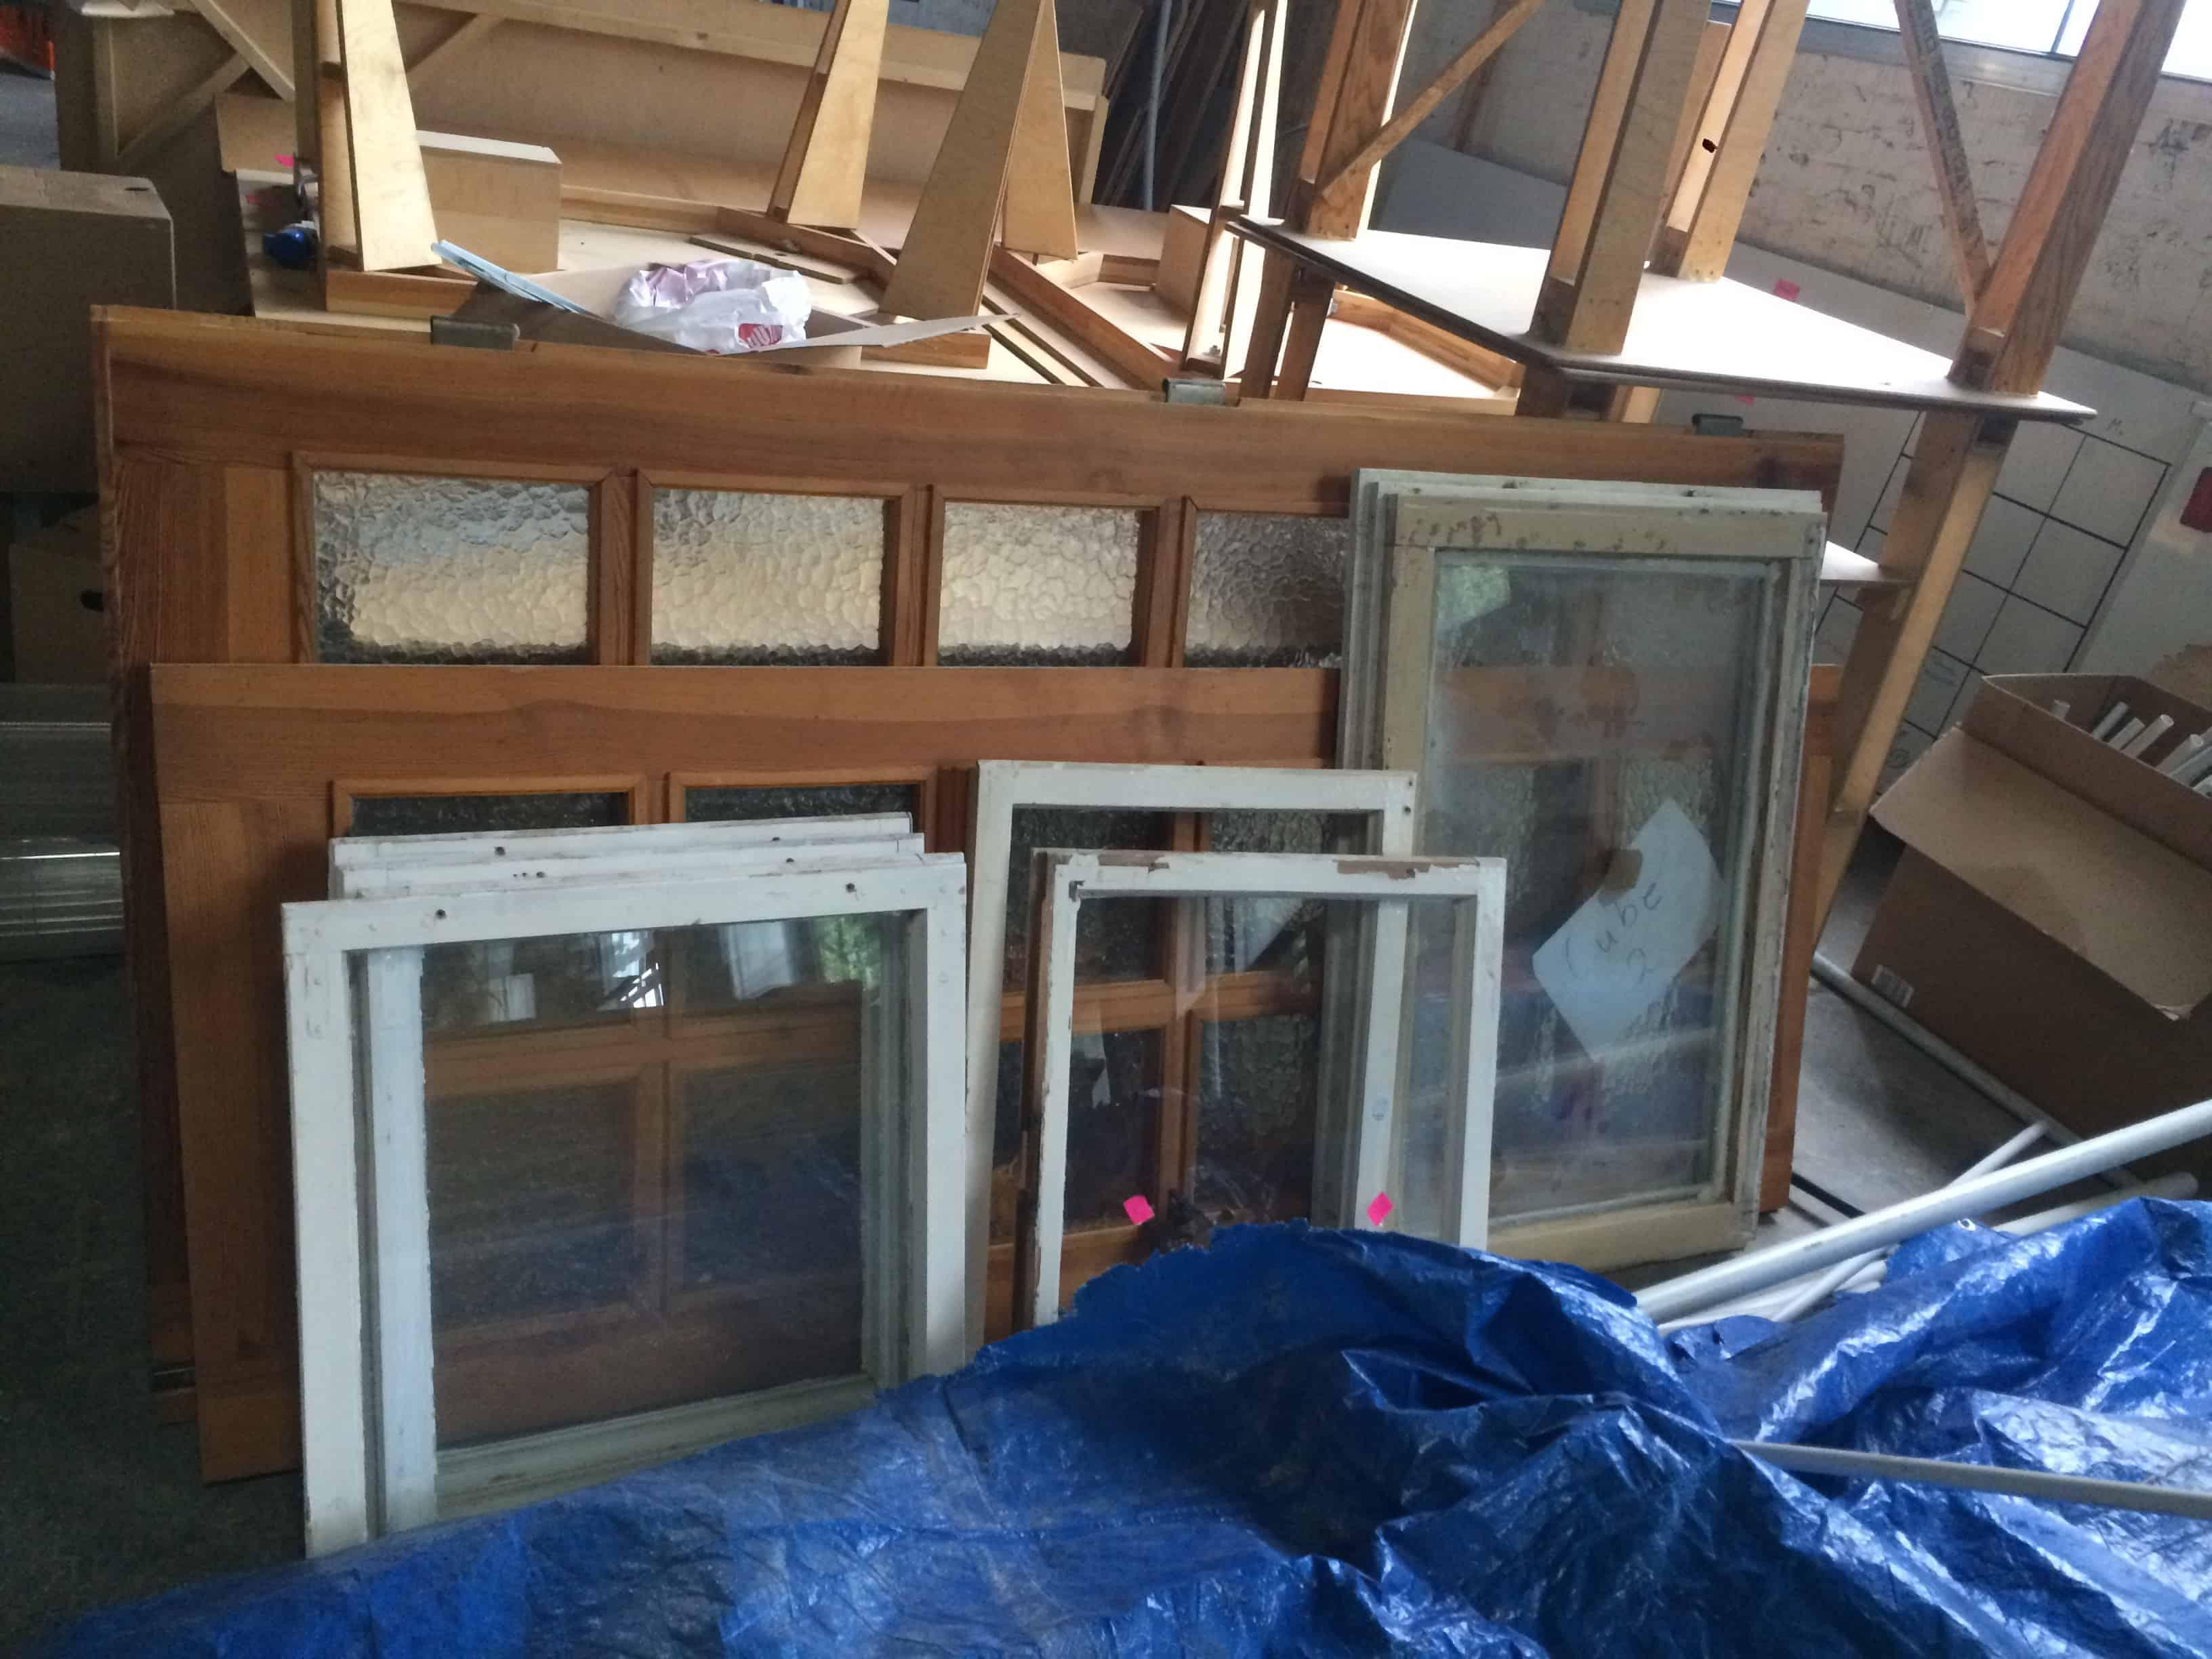 Fensterflügel (Ohne Blendrahmen) - ca. 50 x 60 cm